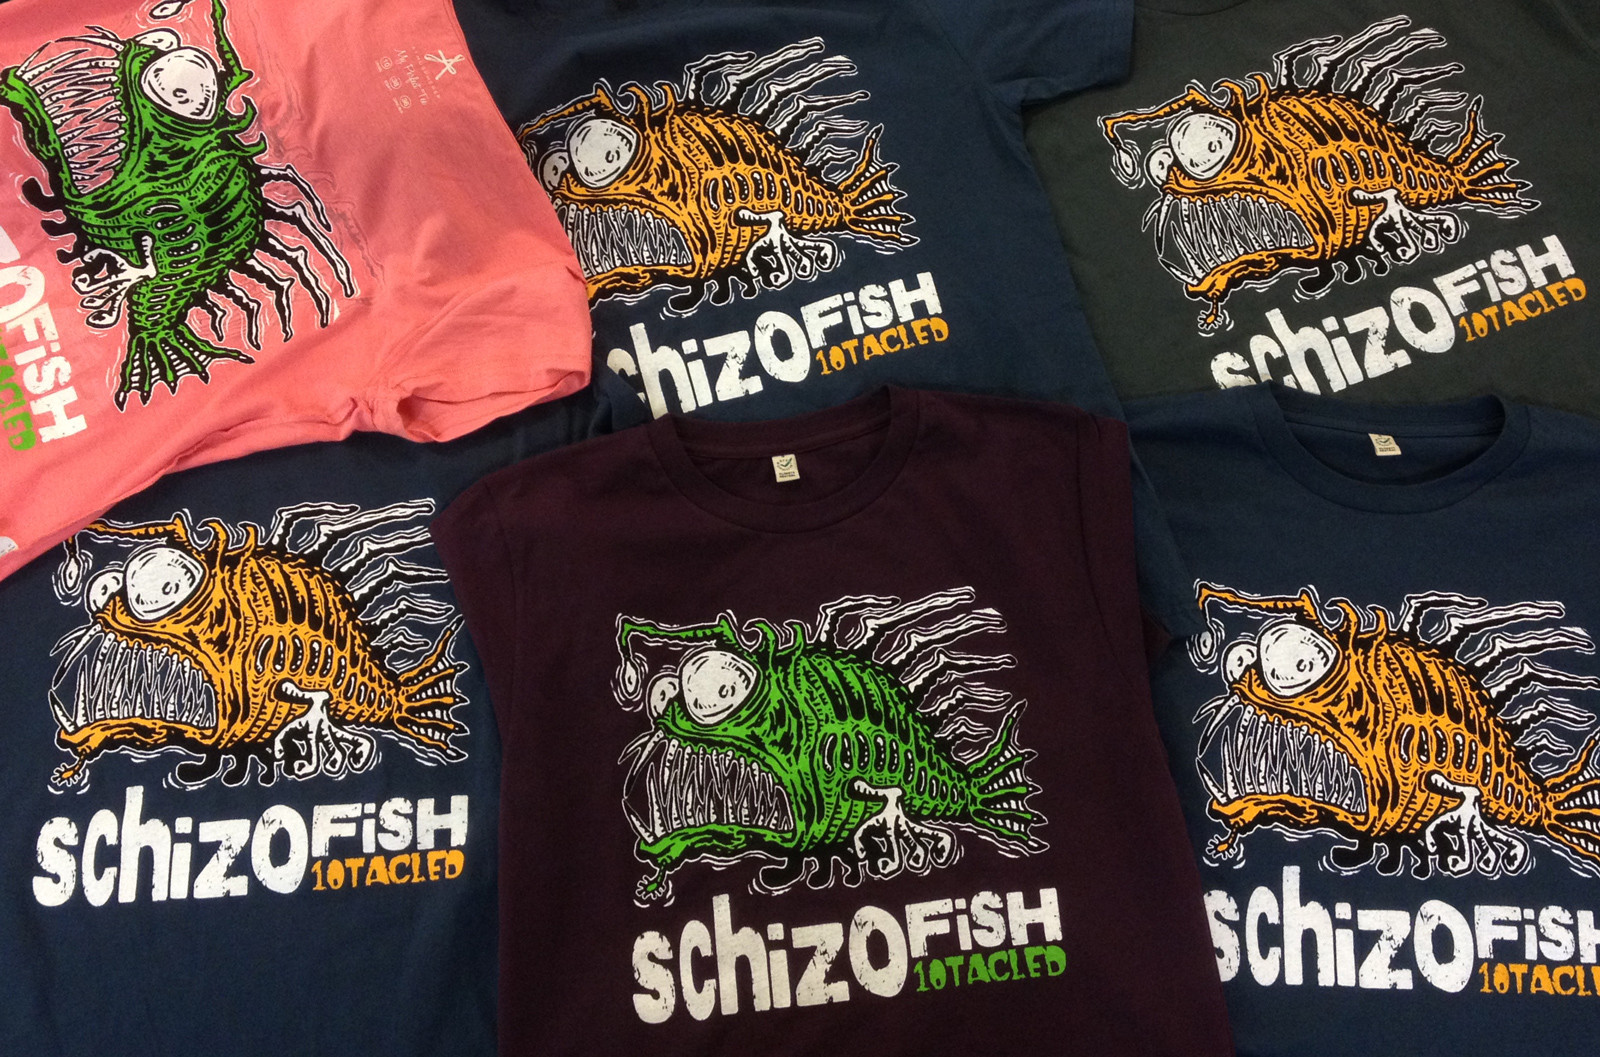 schizofish-tshirts-linocut-martin-marcin